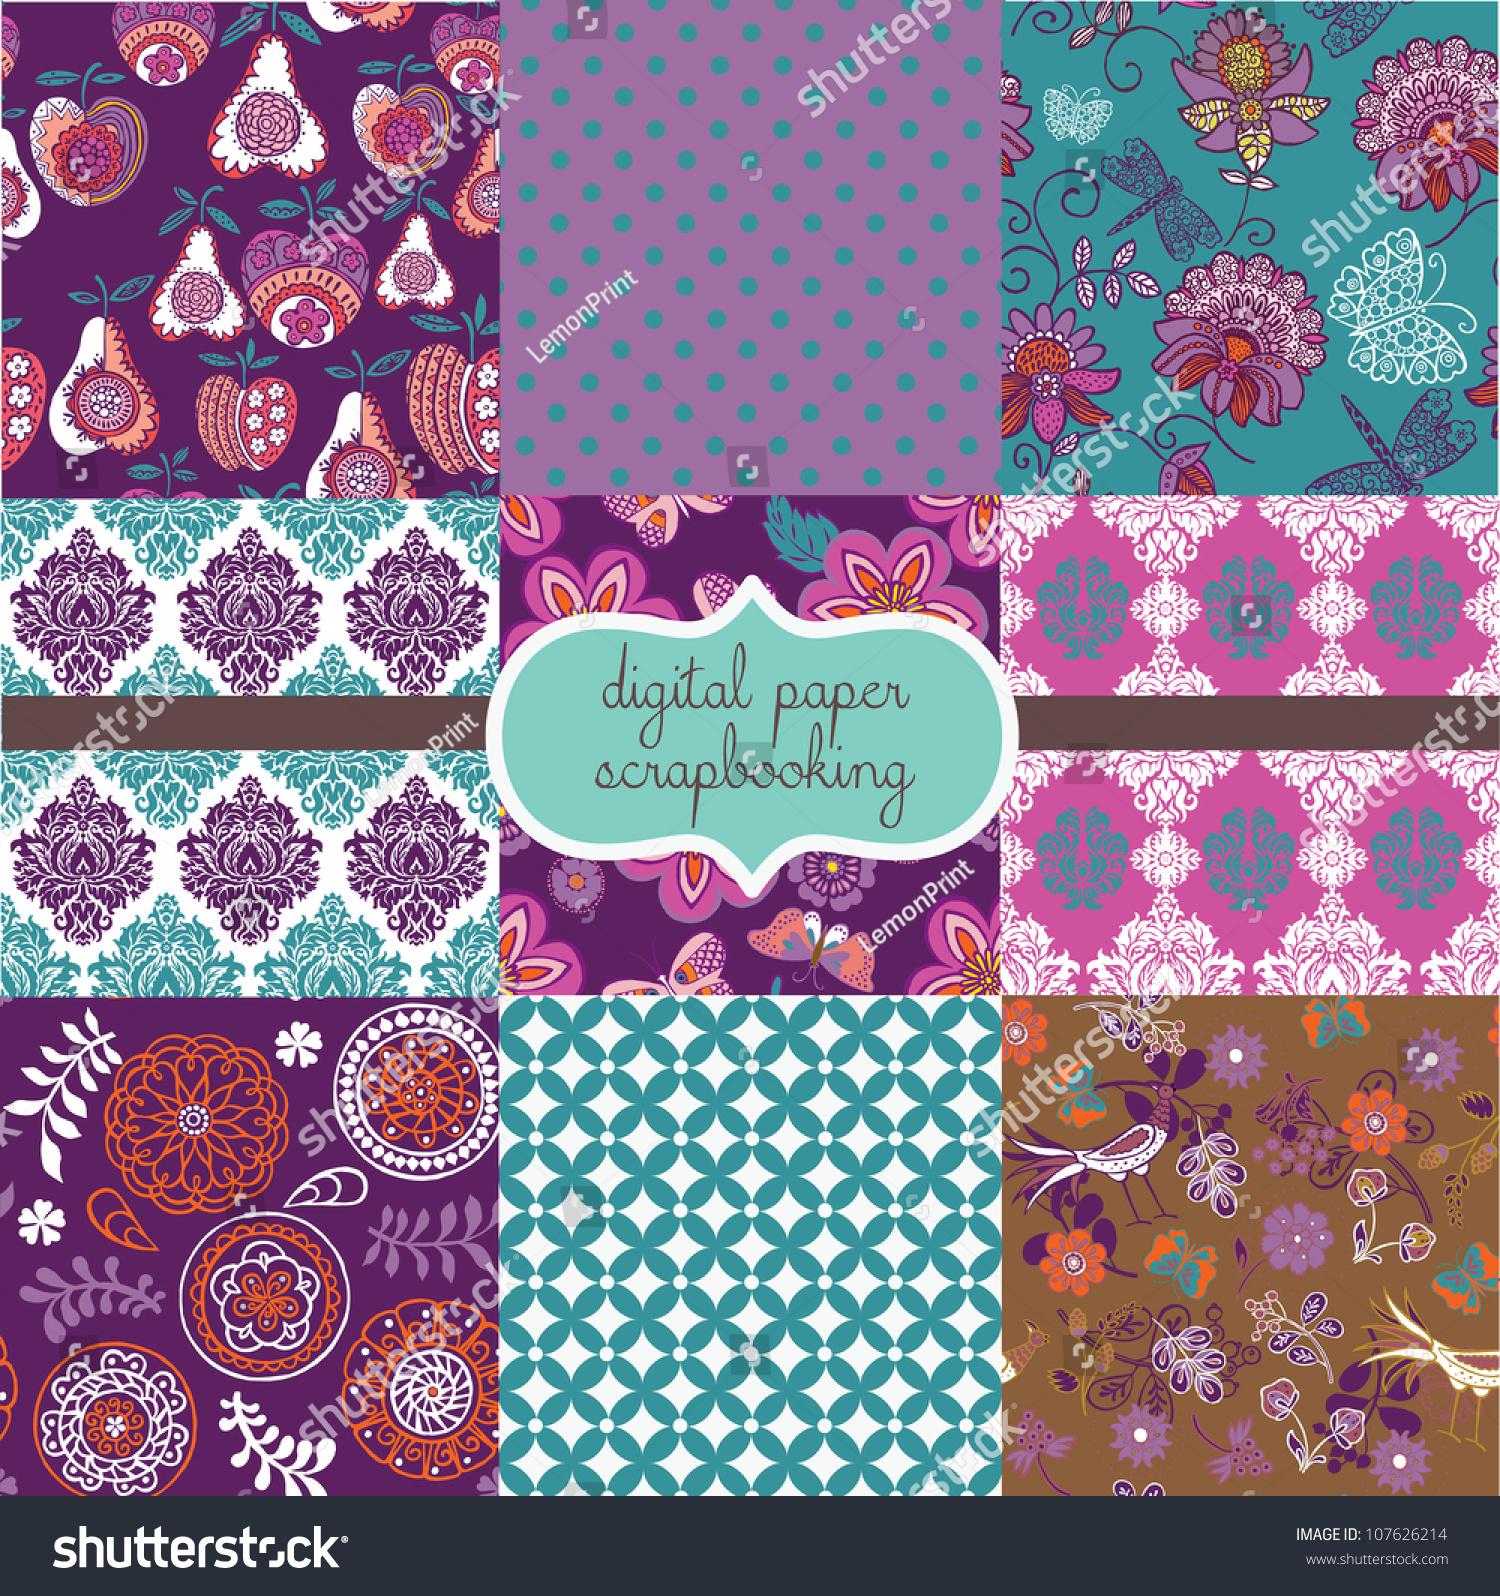 Floral Digital Scrapbook Paper Stock Vector Illustration 107626214 : Shutterstock